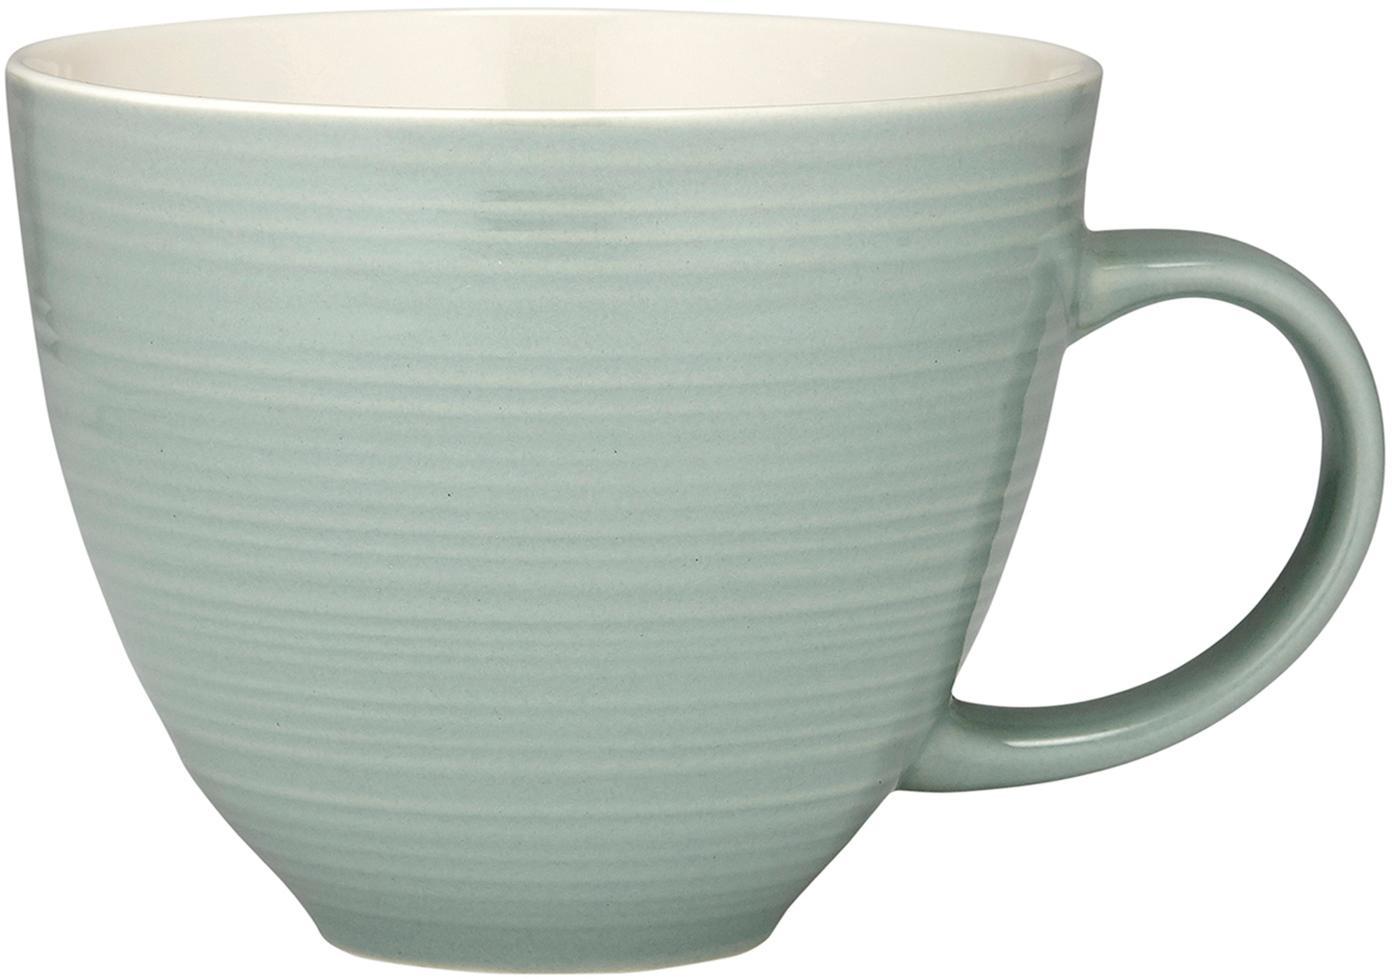 Tazas de café Darby, 4uds., Porcelana New Bone, Verde, blanco crudo, Ø 24 x Al 11 cm